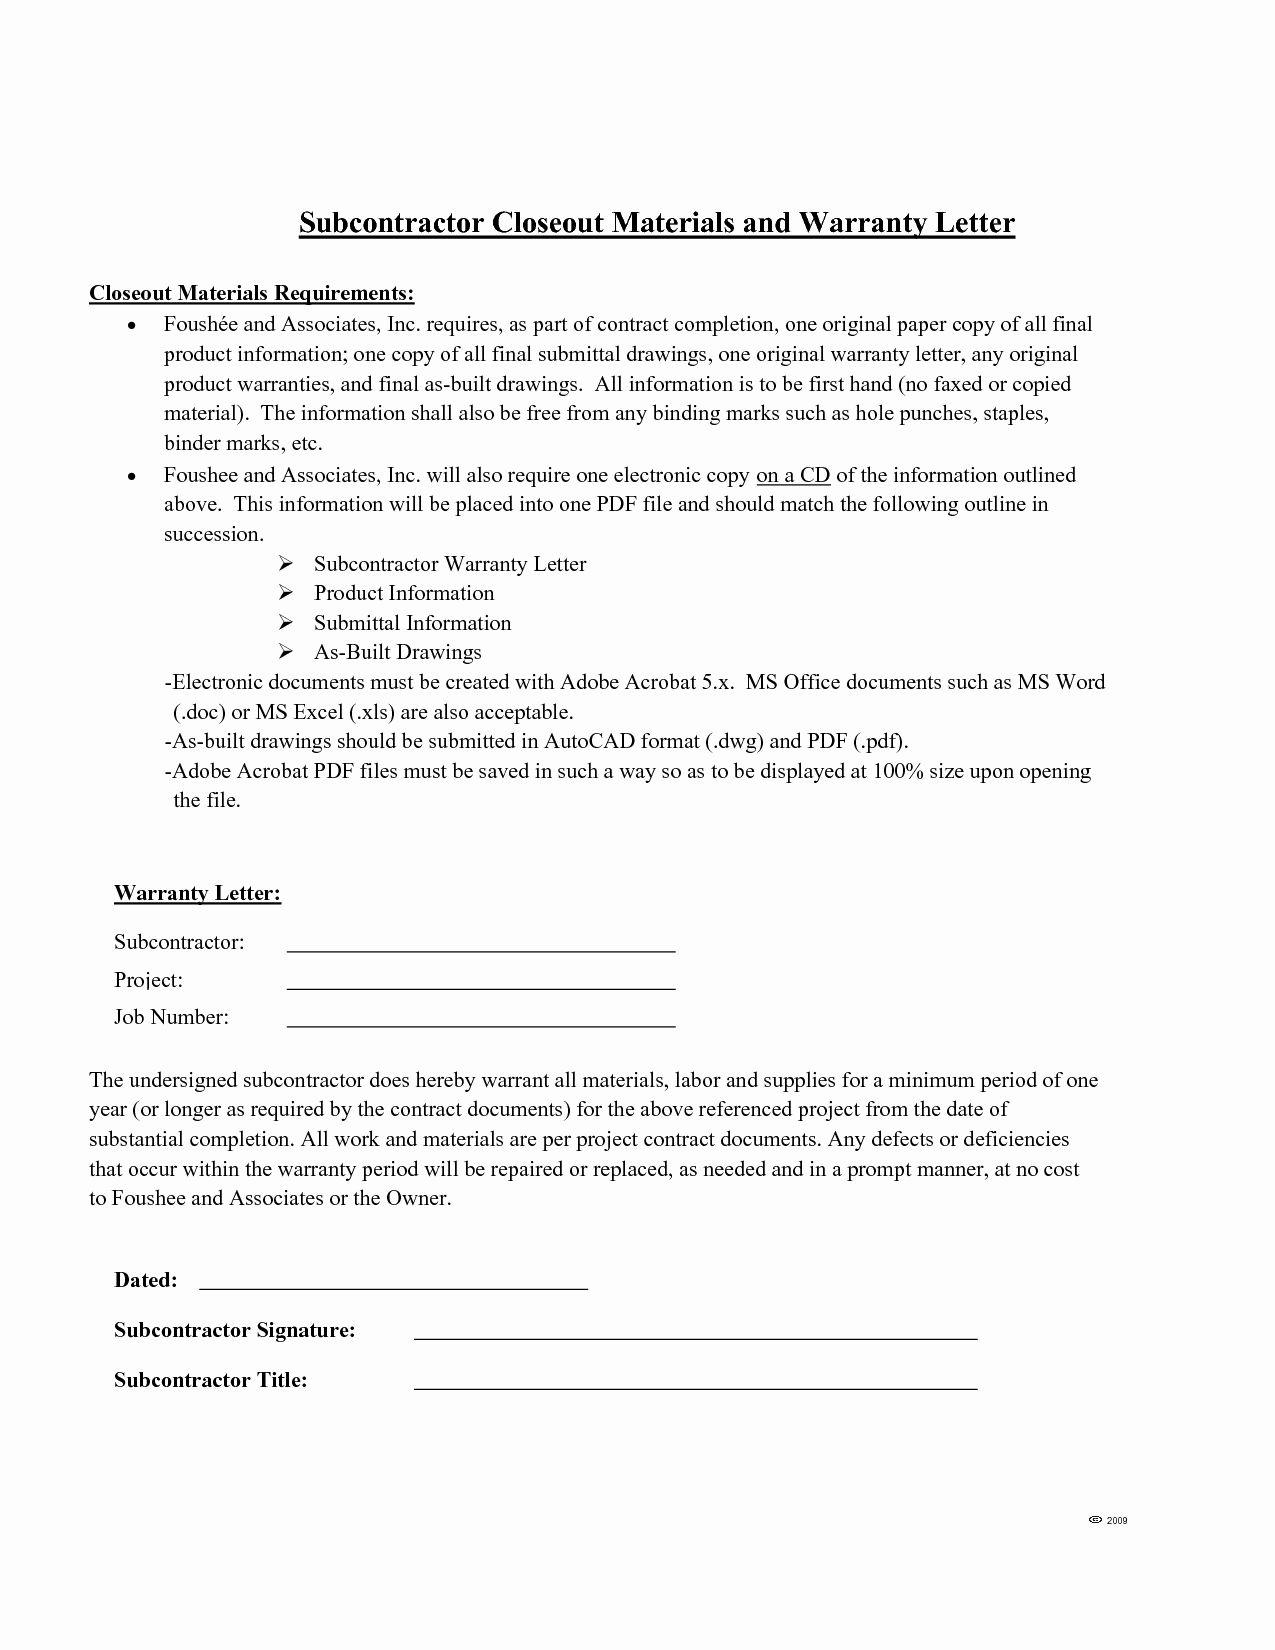 Warranty Letter General Contractor Awesome Letter Warranty